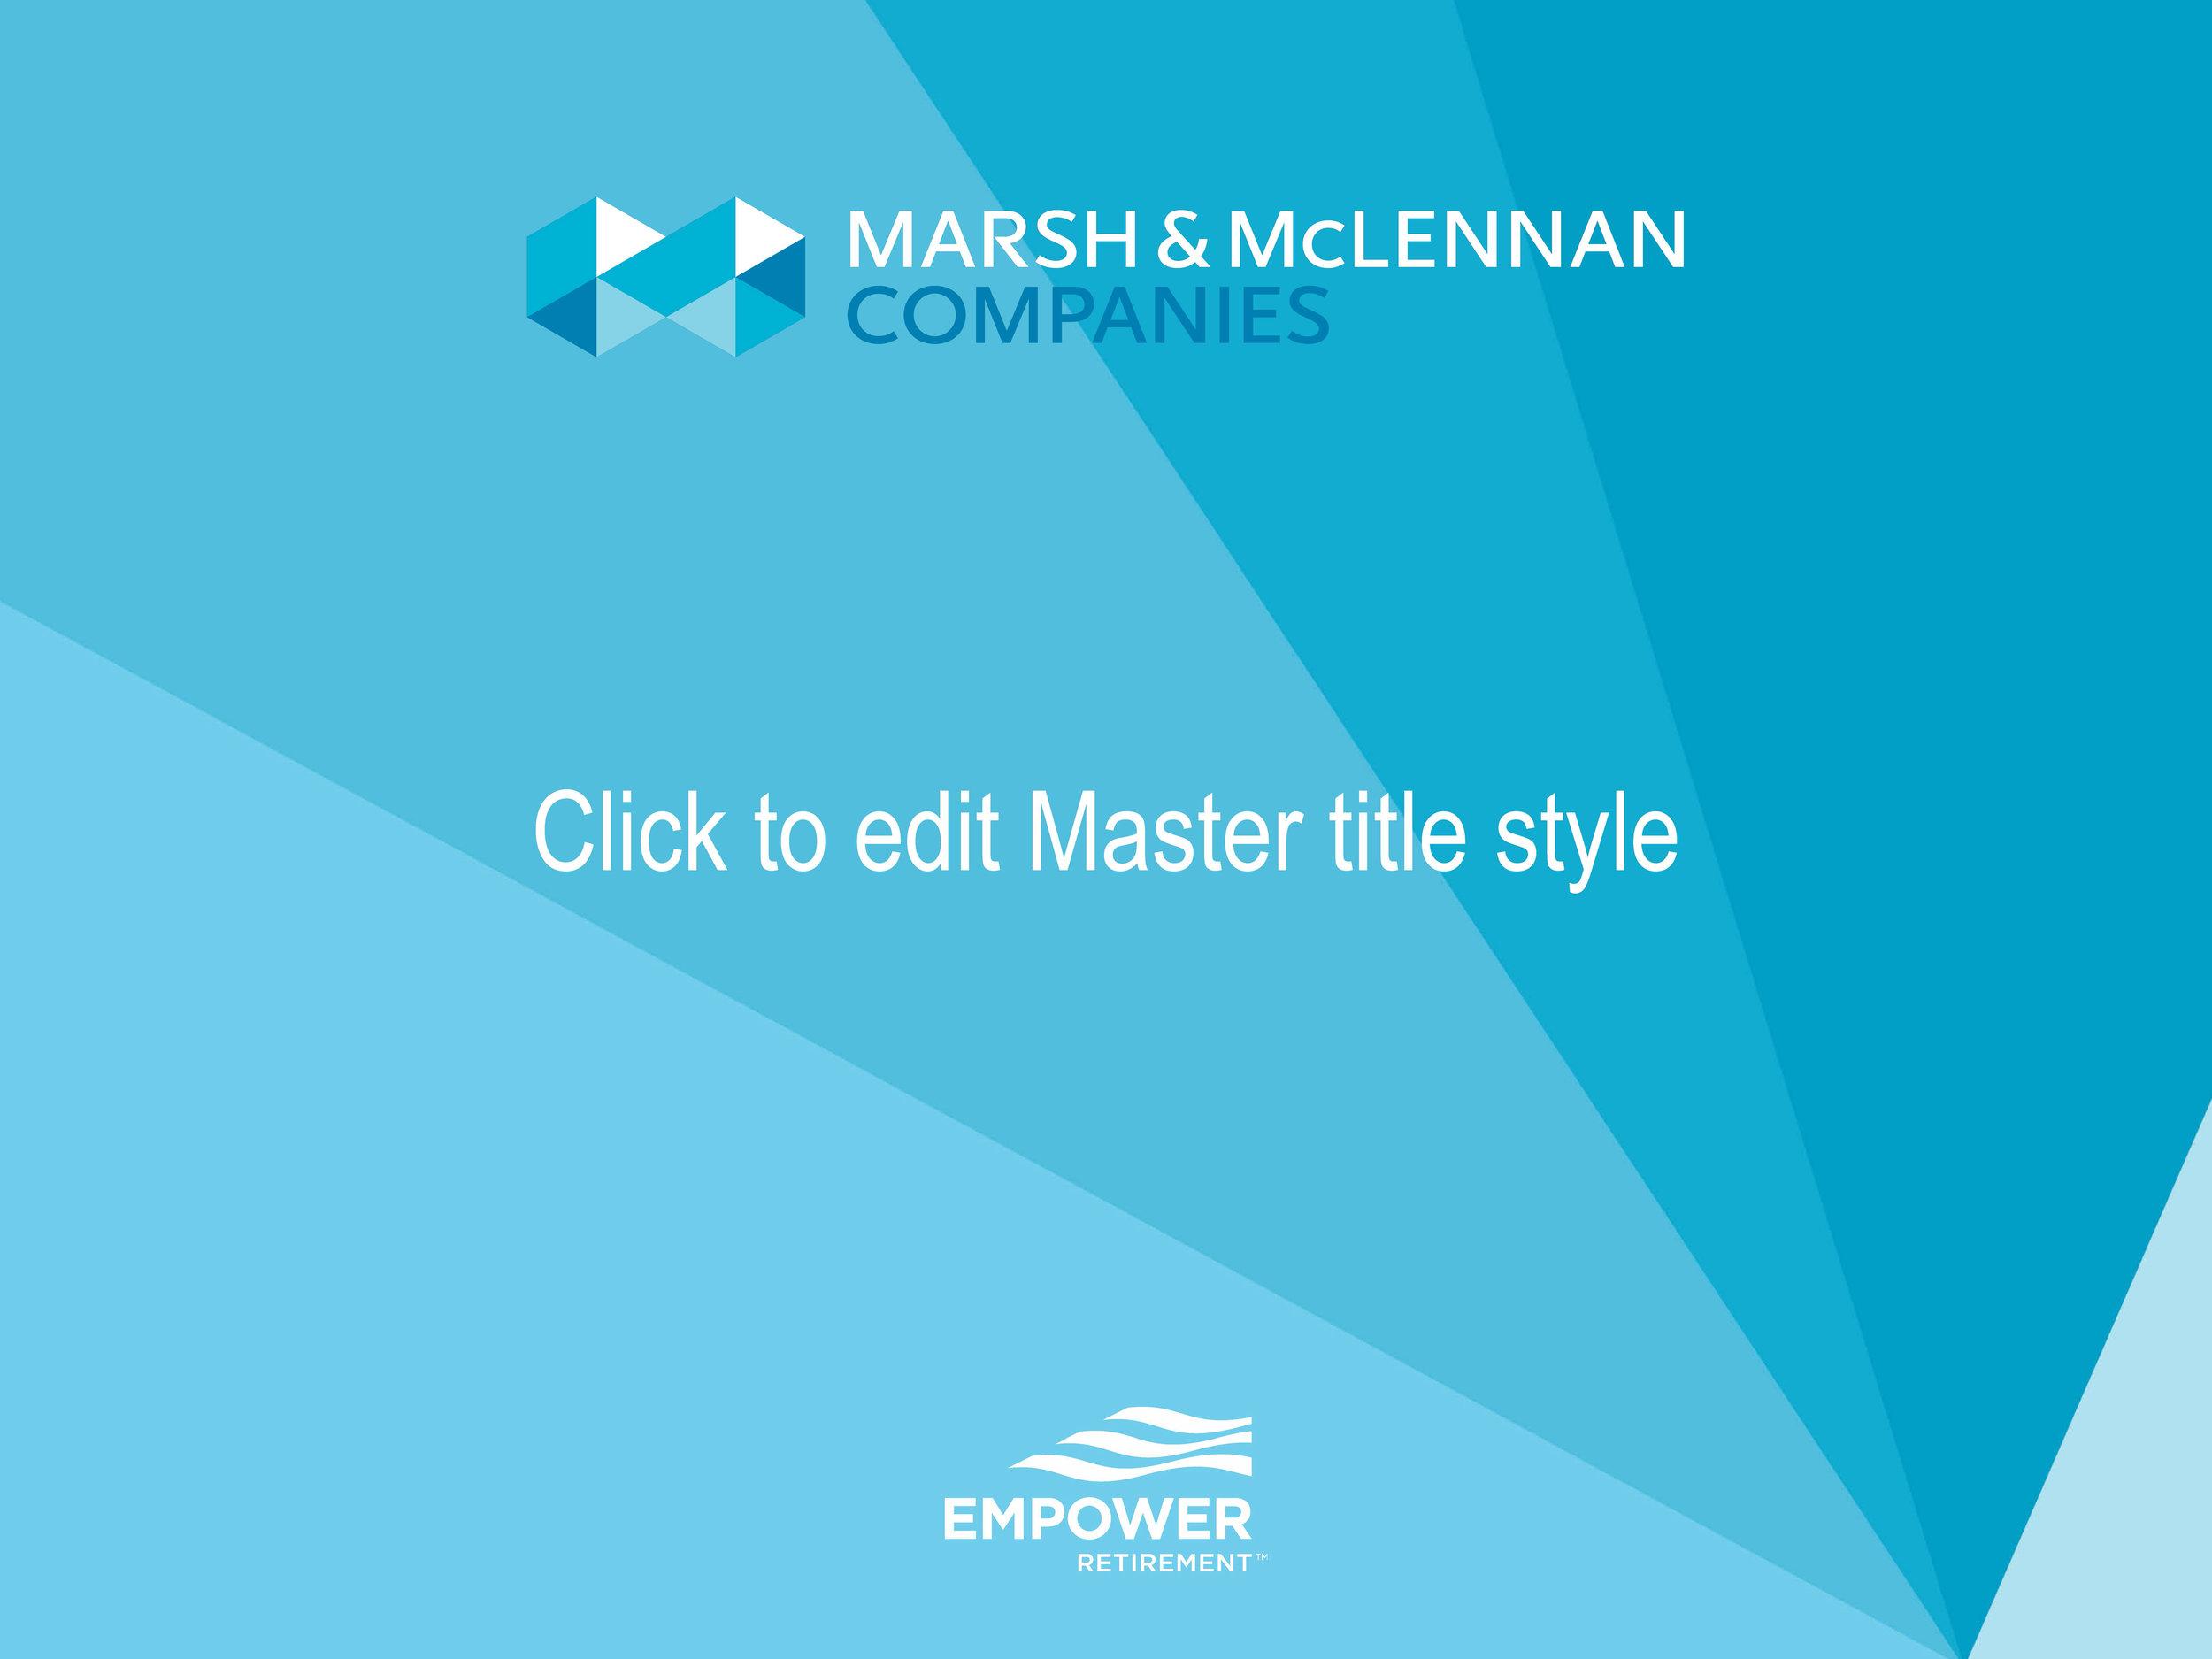 mmc-presentation-ERSF-COB-16892-1806_Page_02.jpg